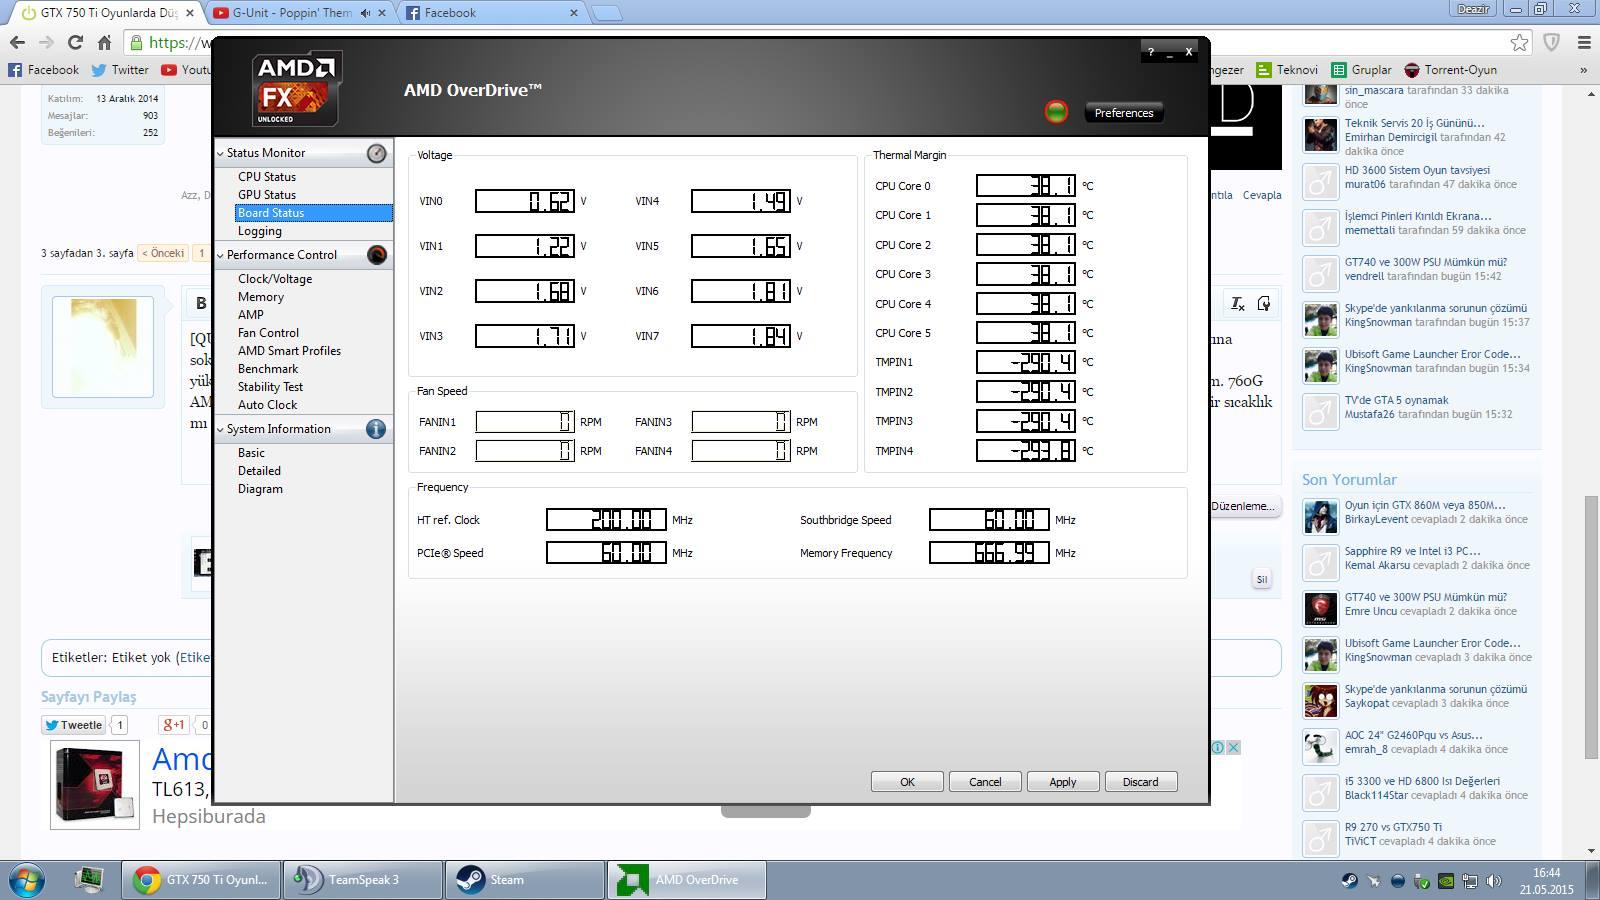 AMD OverDrive Fan Ayarları - Technopat Sosyal